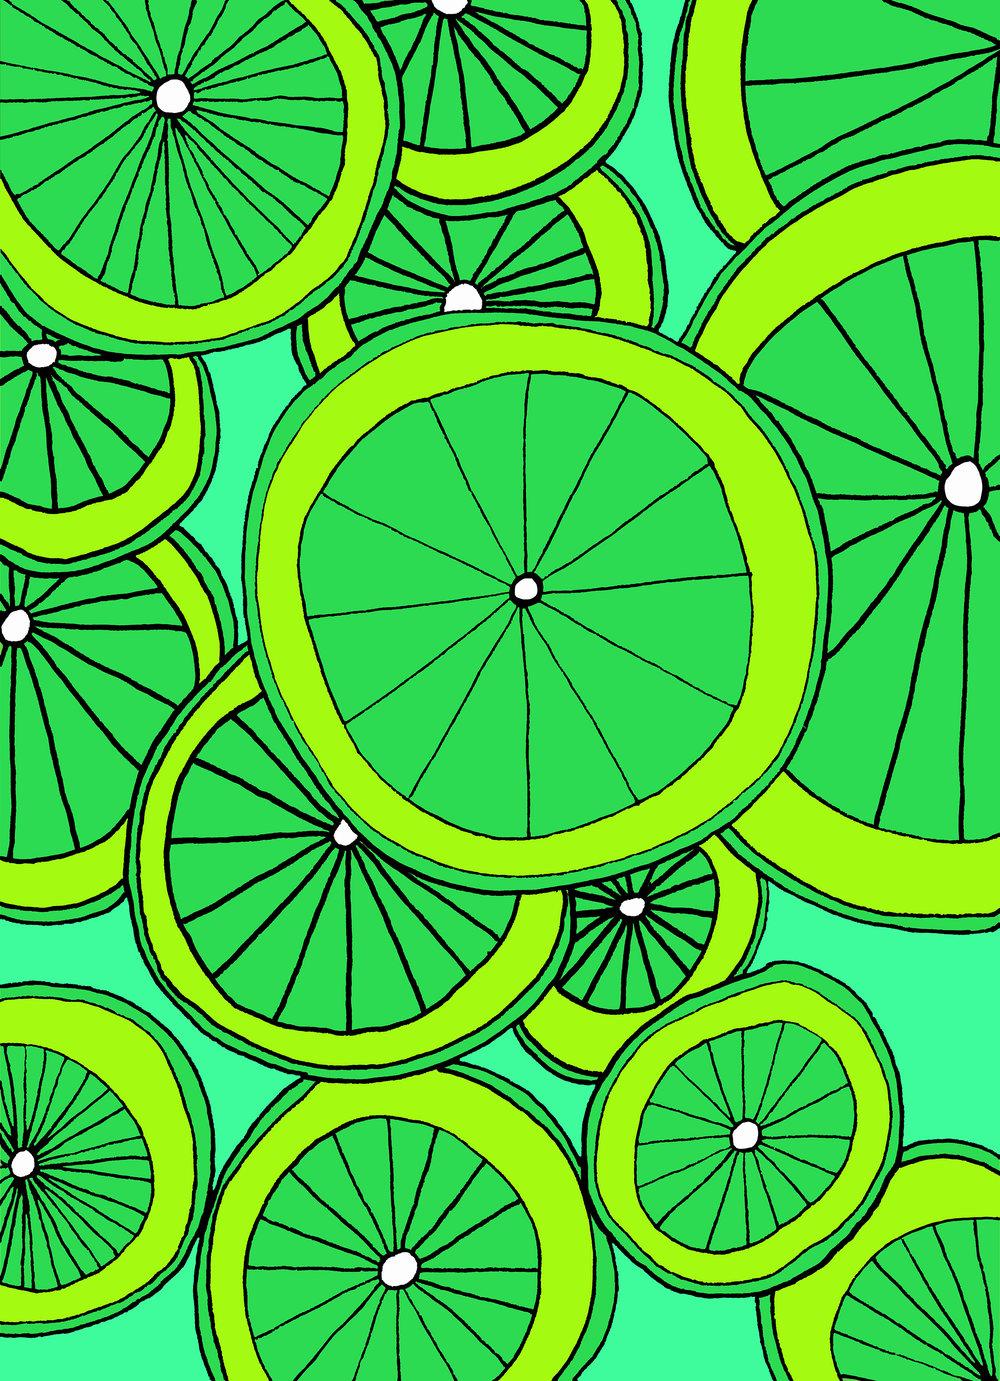 Limes_web.jpg